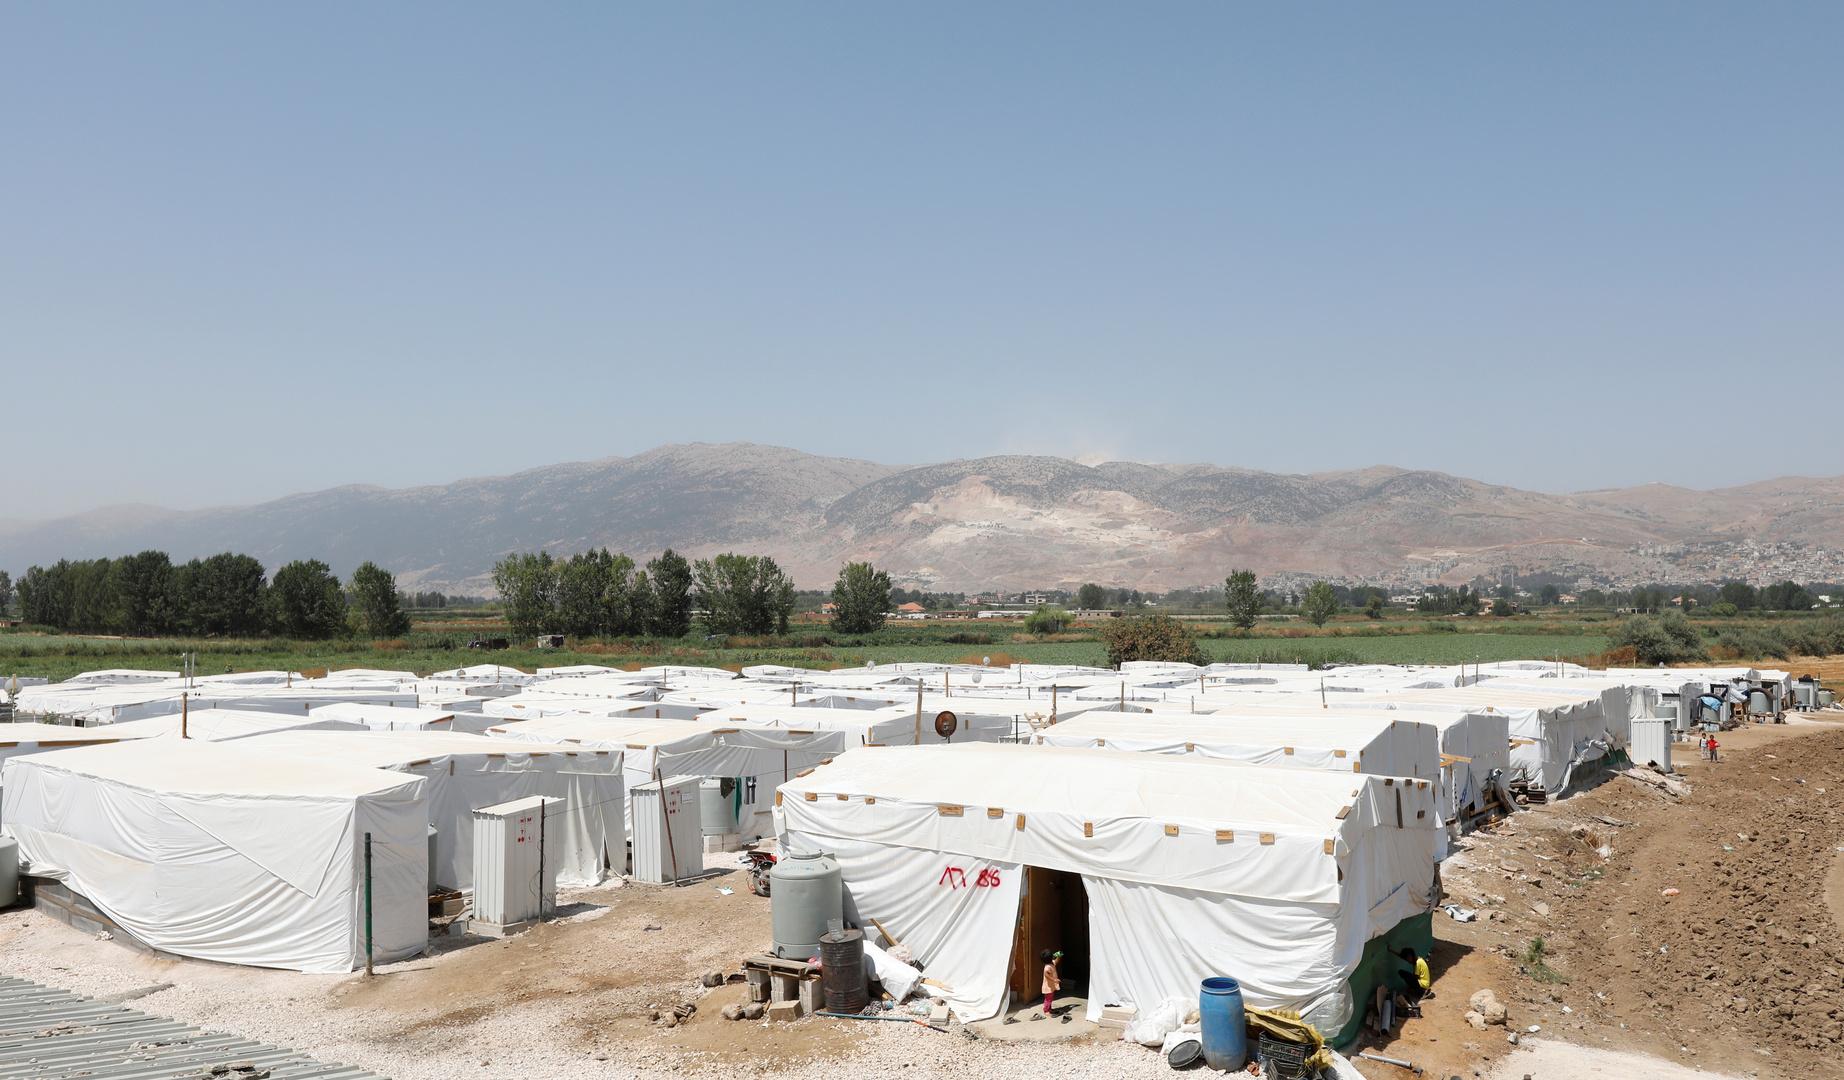 مخيمات للاجئين سوريين في لبنان